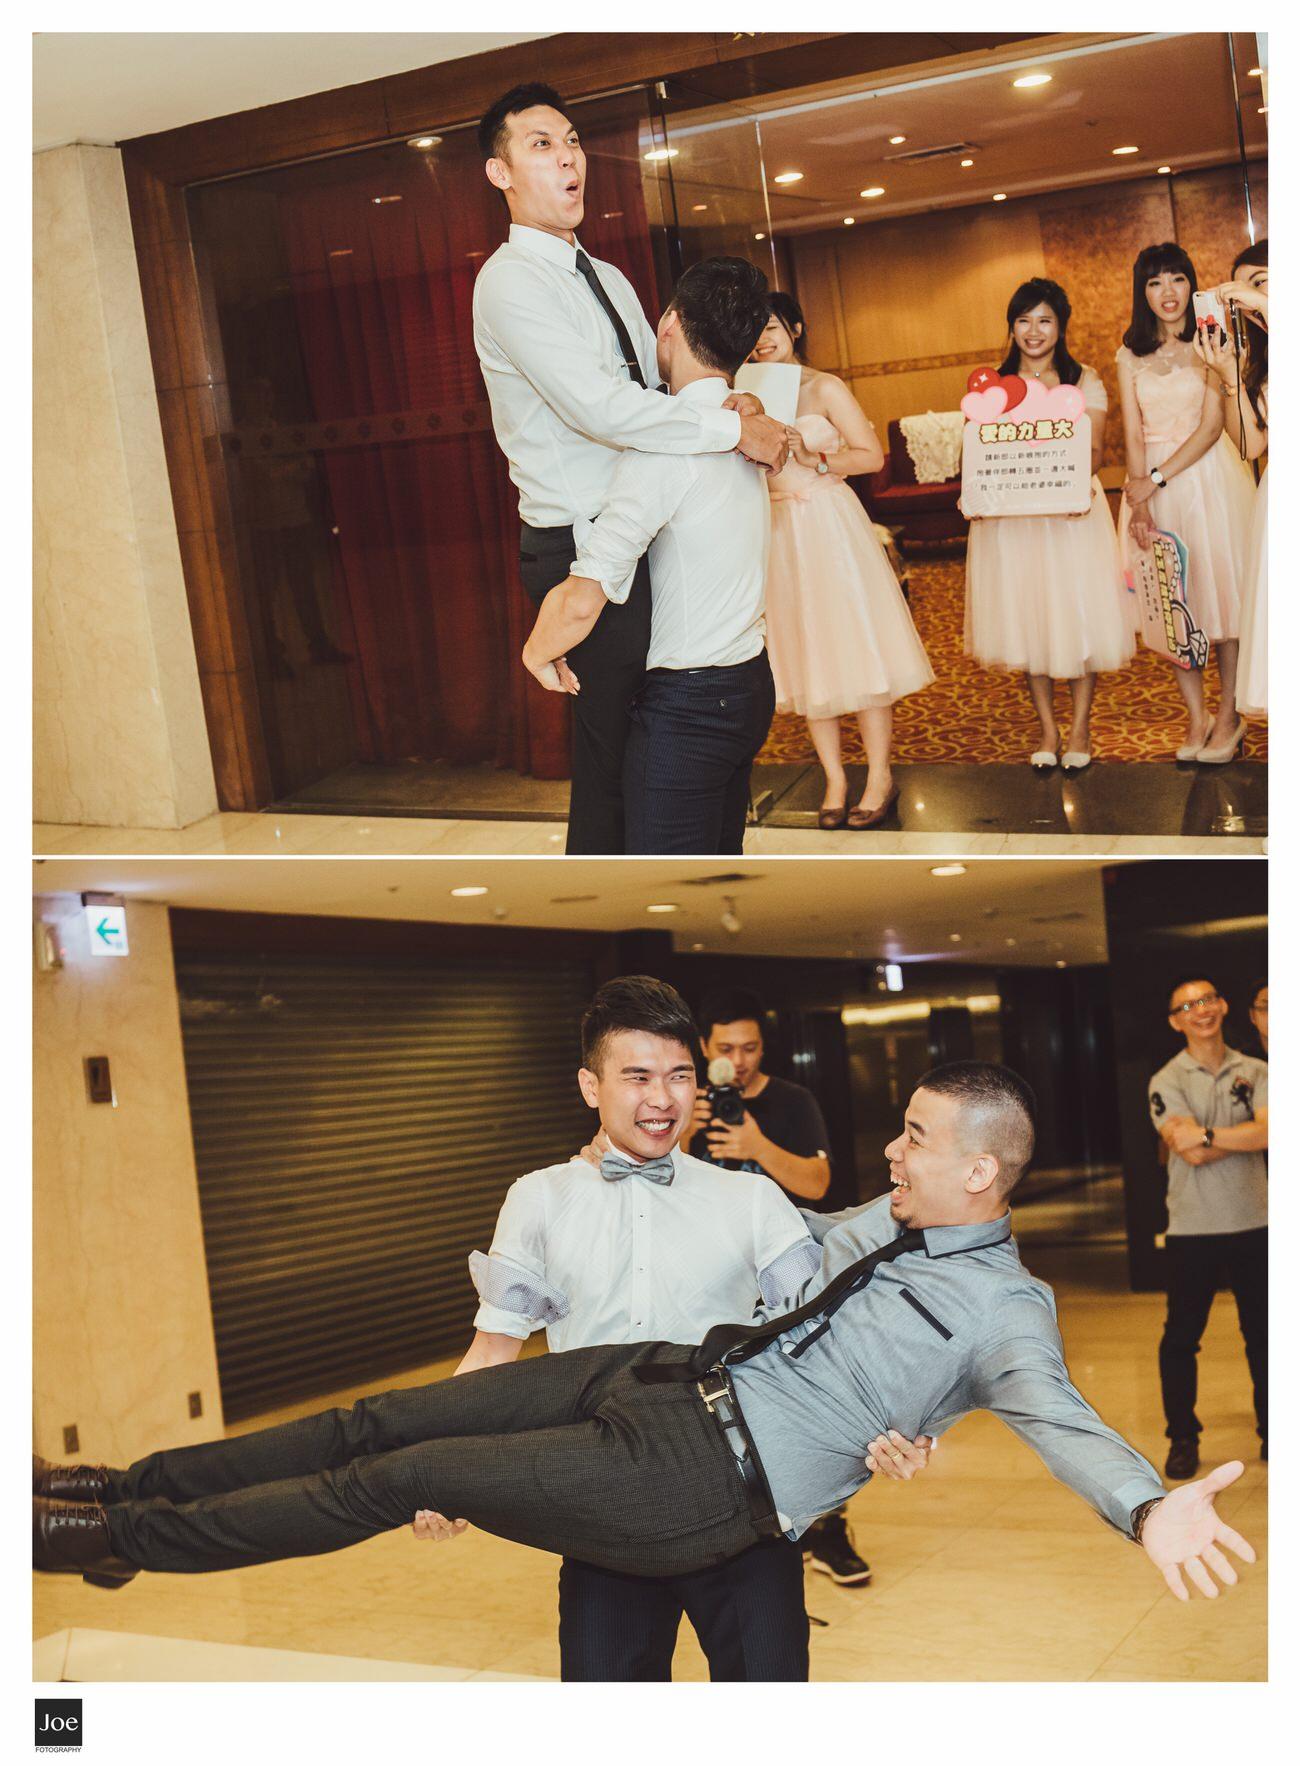 sunworld-dynasty-hotel-taipei-wedding-photo-joe-fotography-angel-jay-036.jpg